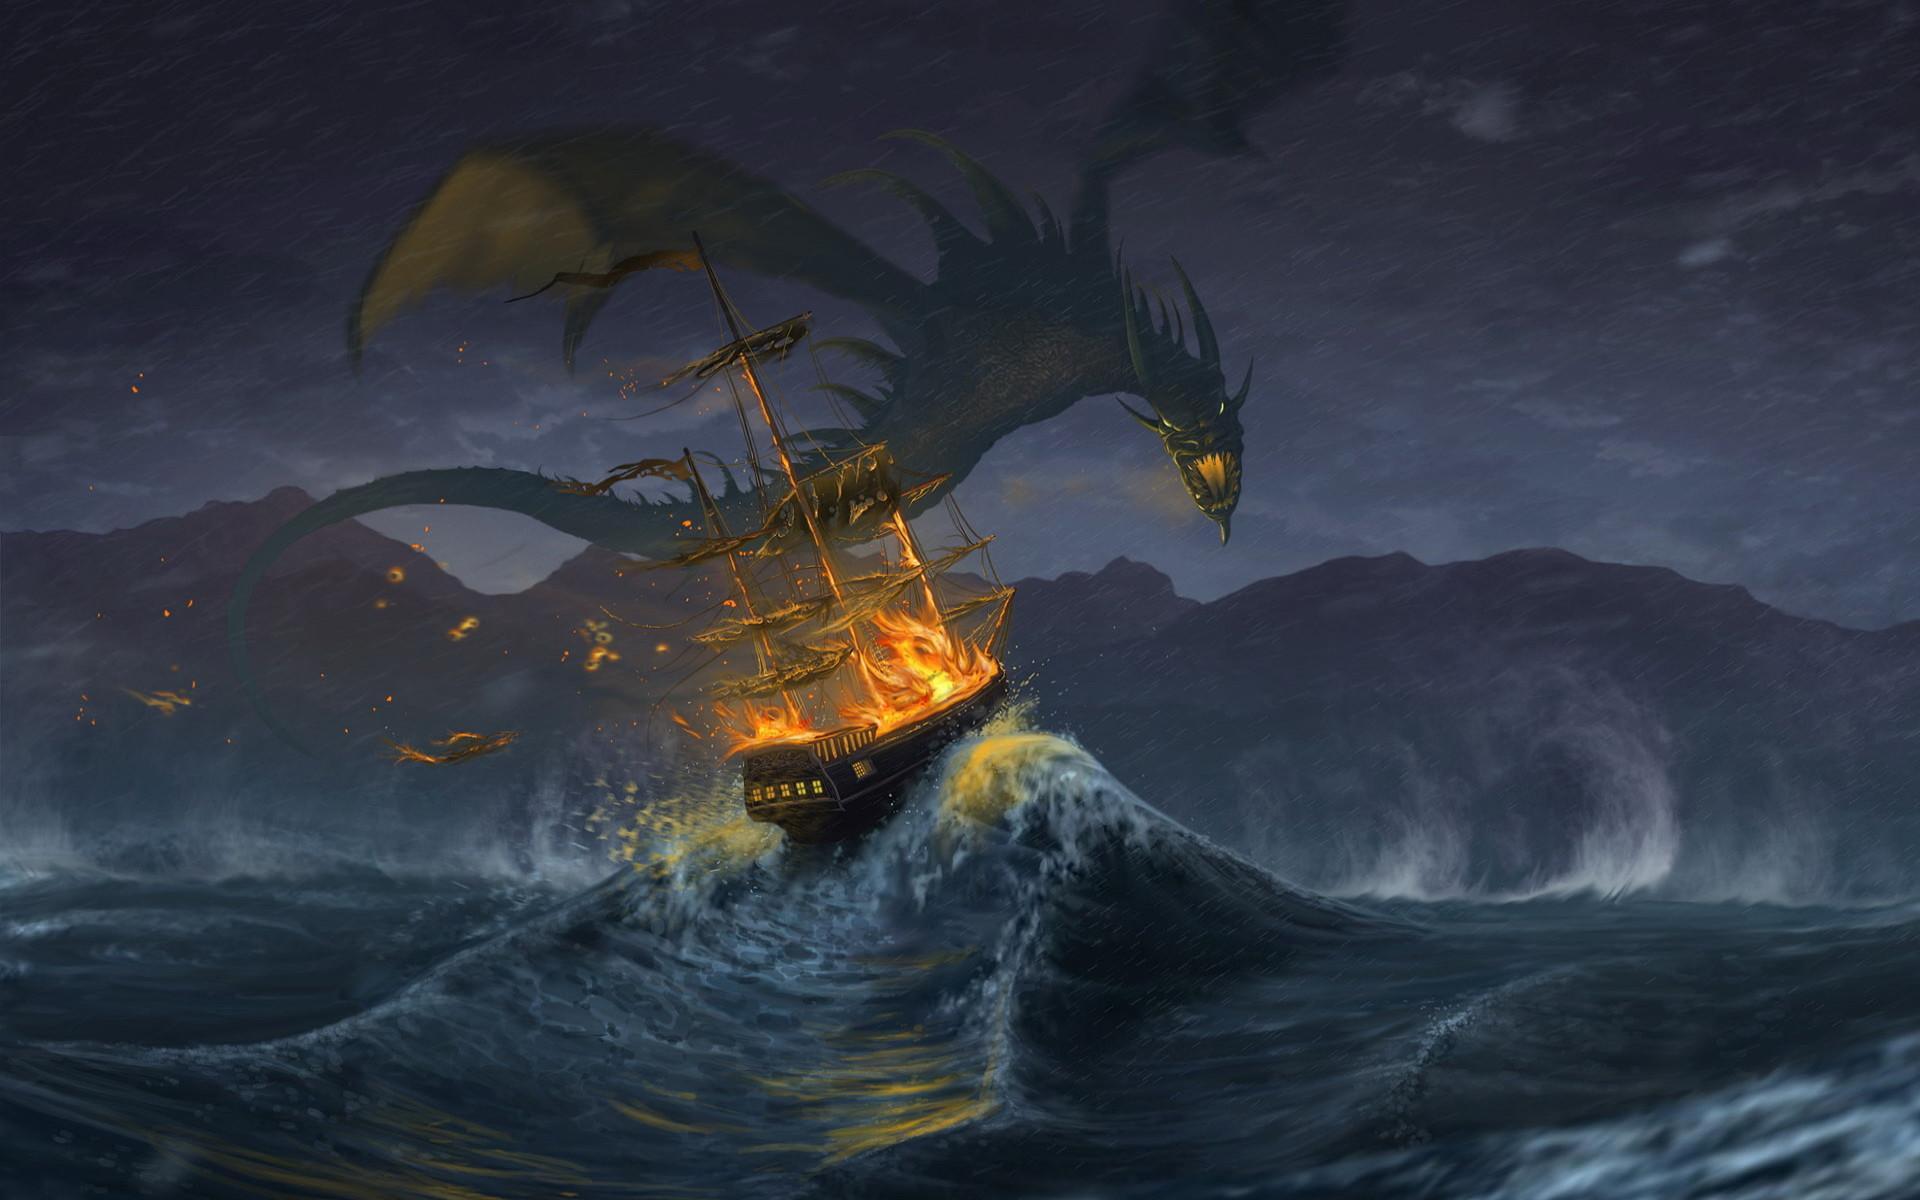 Fantasy Dragon Wallpapers Biography Signeduponawhim said: Dragon's  name:Kereros, Scyrthorn, or Warloth Colour:ash-grey and .